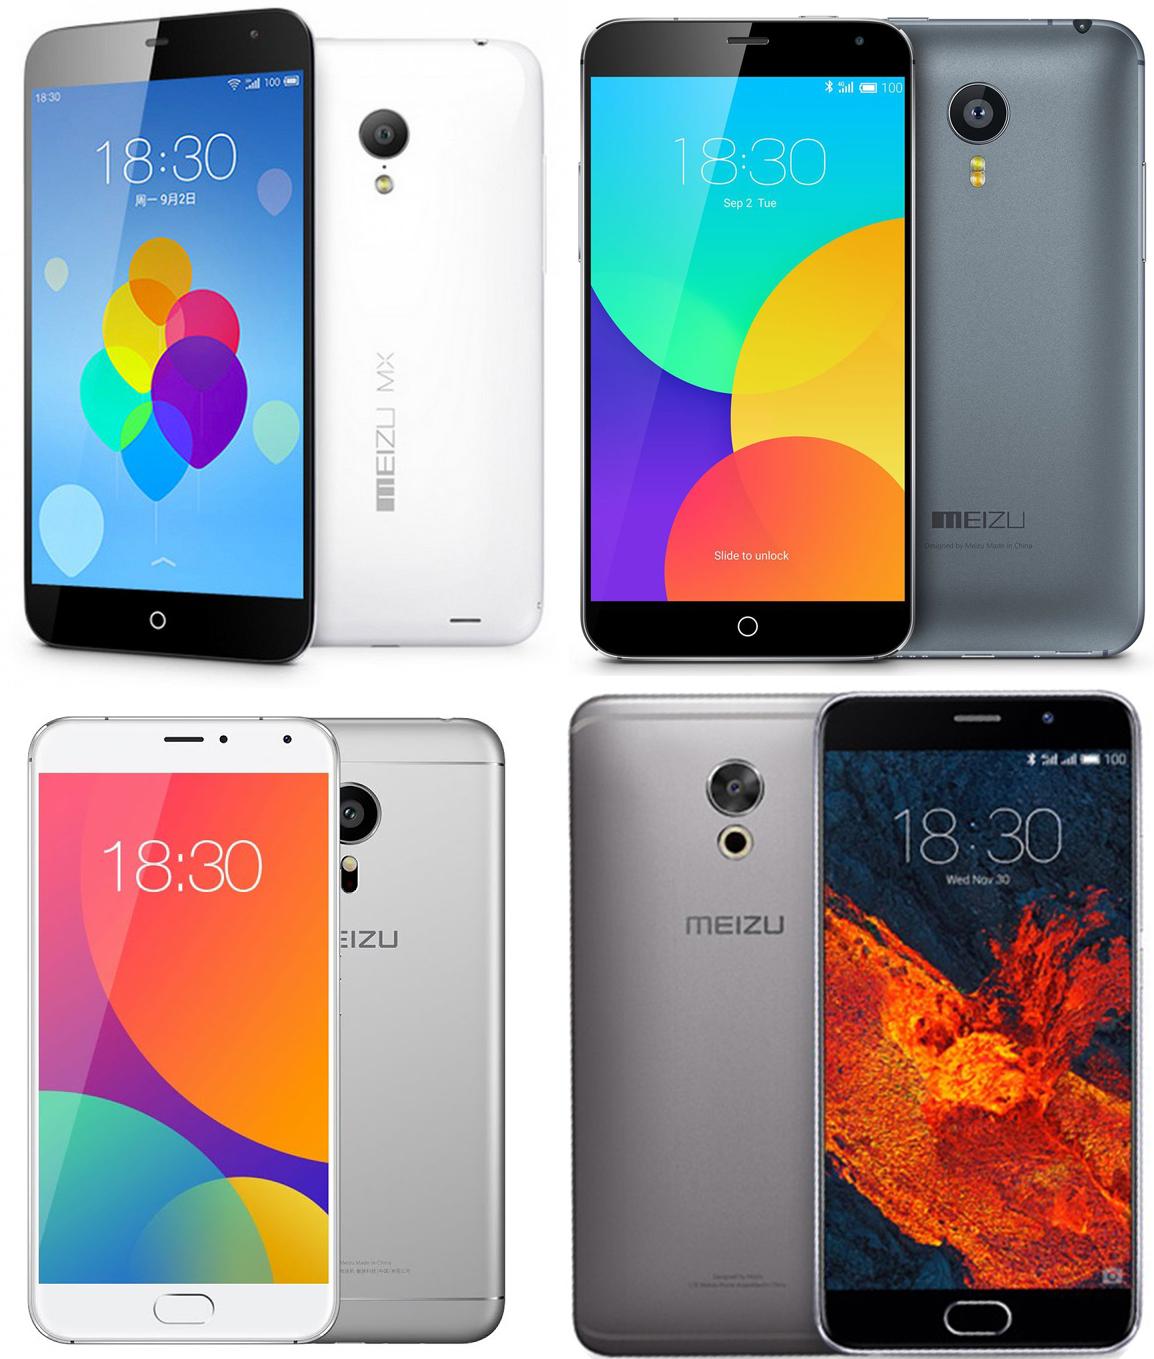 Список смартфонов Meizu с NFC модулем